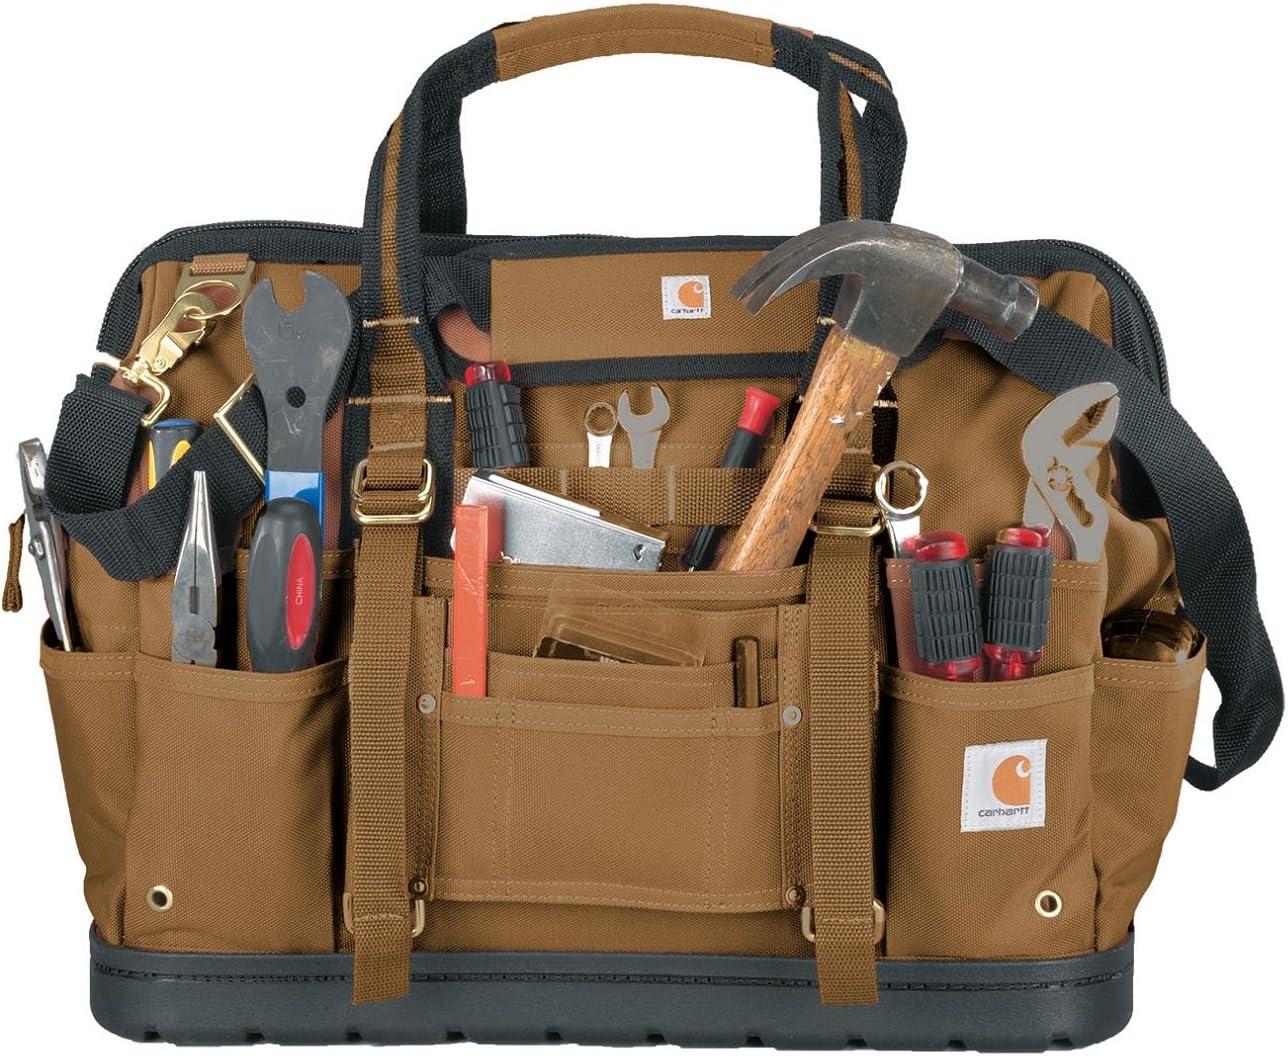 8926140702 Carhartt Legacy Sac /à outils